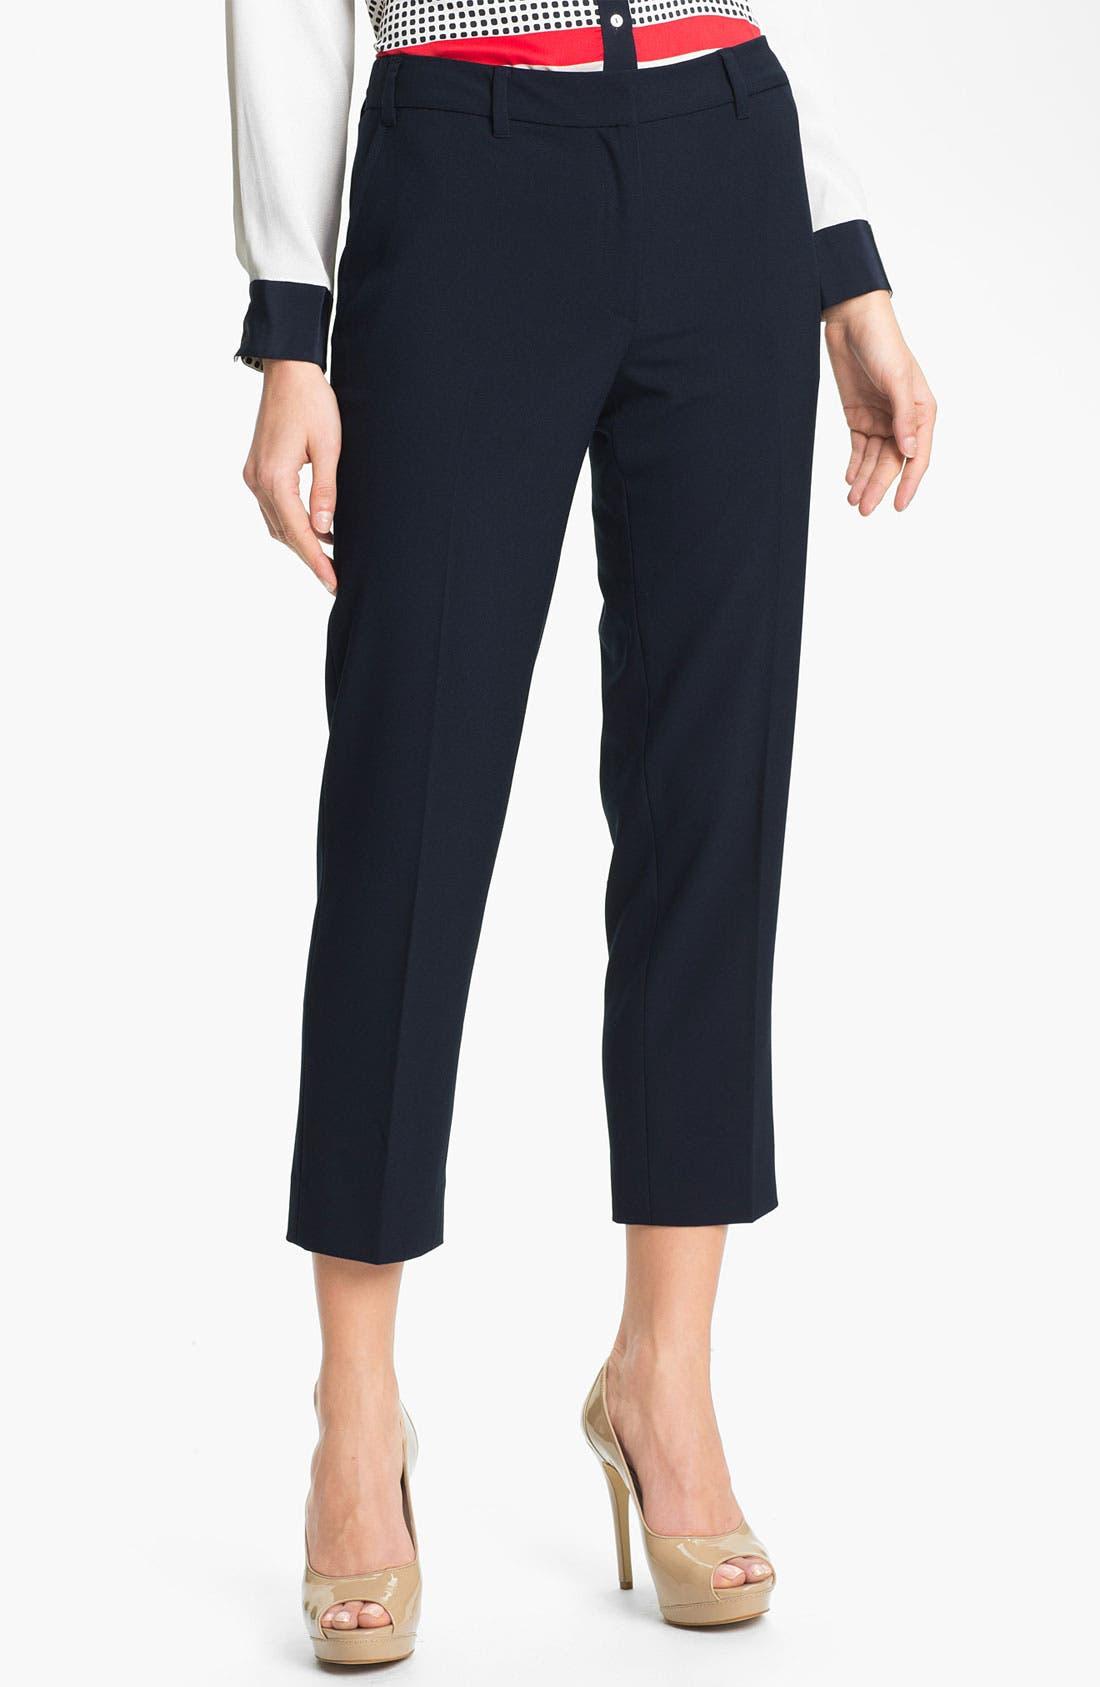 Alternate Image 1 Selected - Adrianna Papell Double Belt Loop Crop Pants